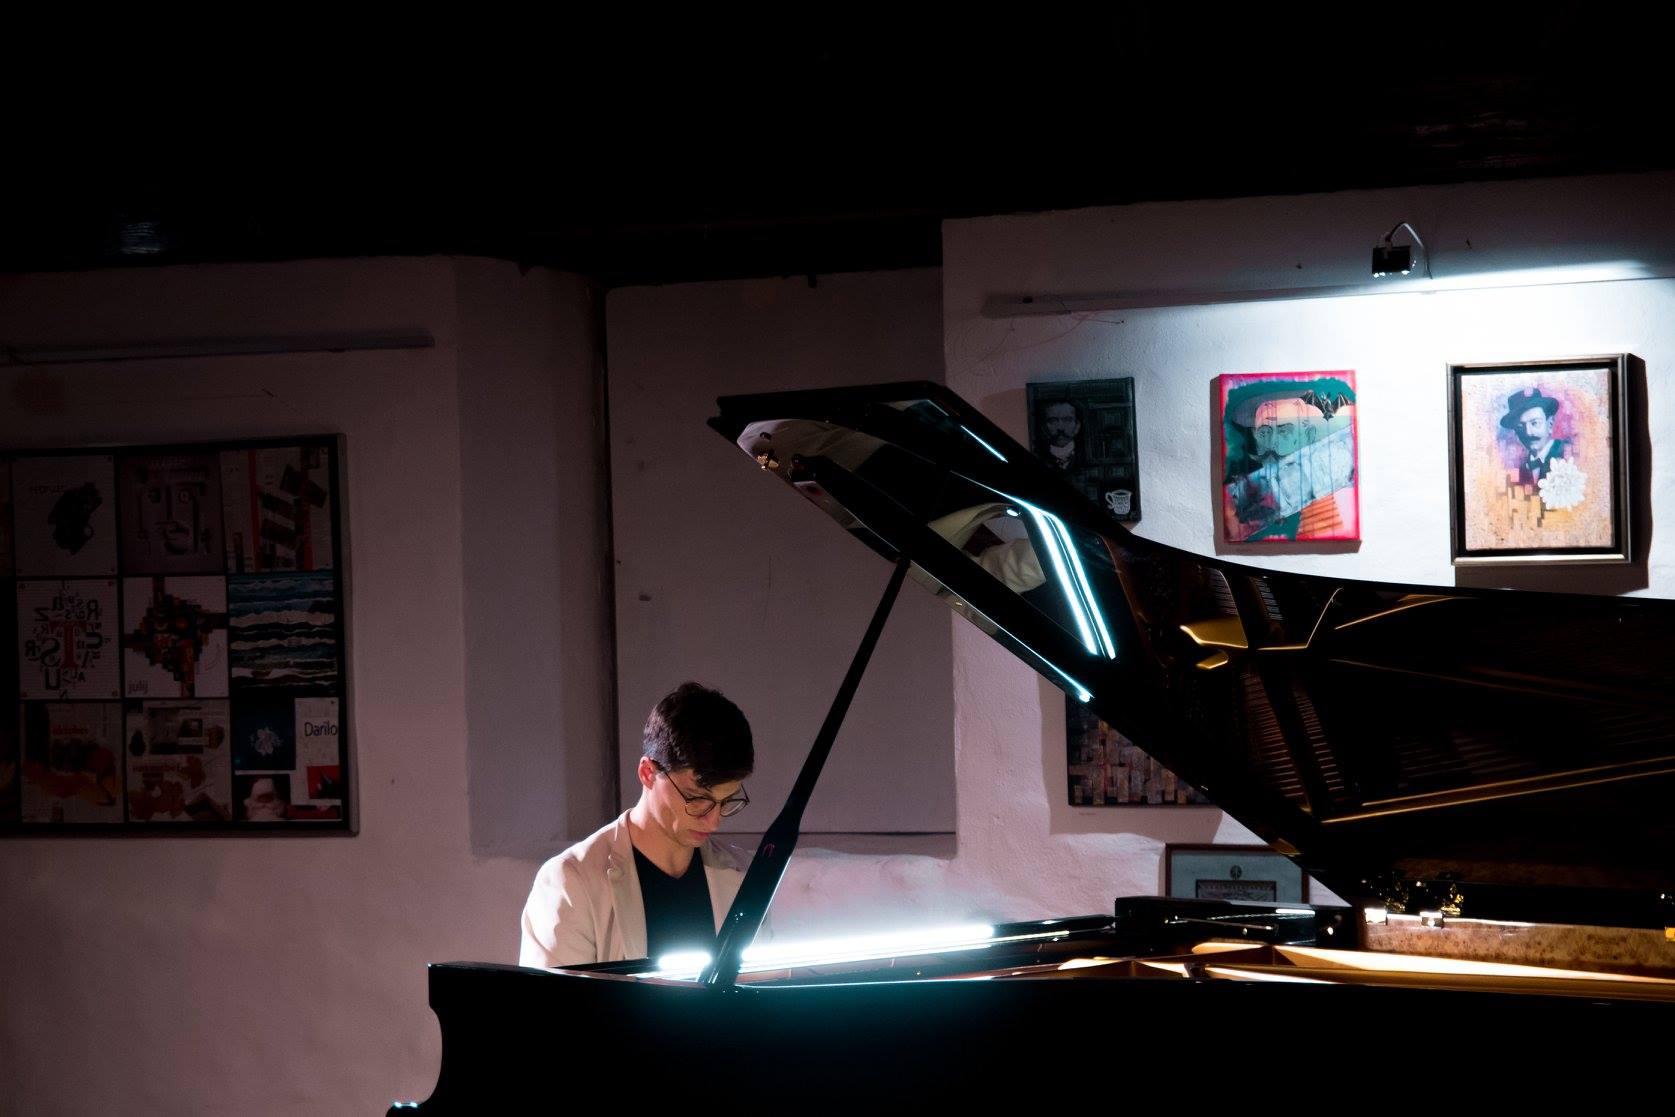 45-Jure-Goručan-Pianopolis-2018.-Foto-Črt-Štrubelj